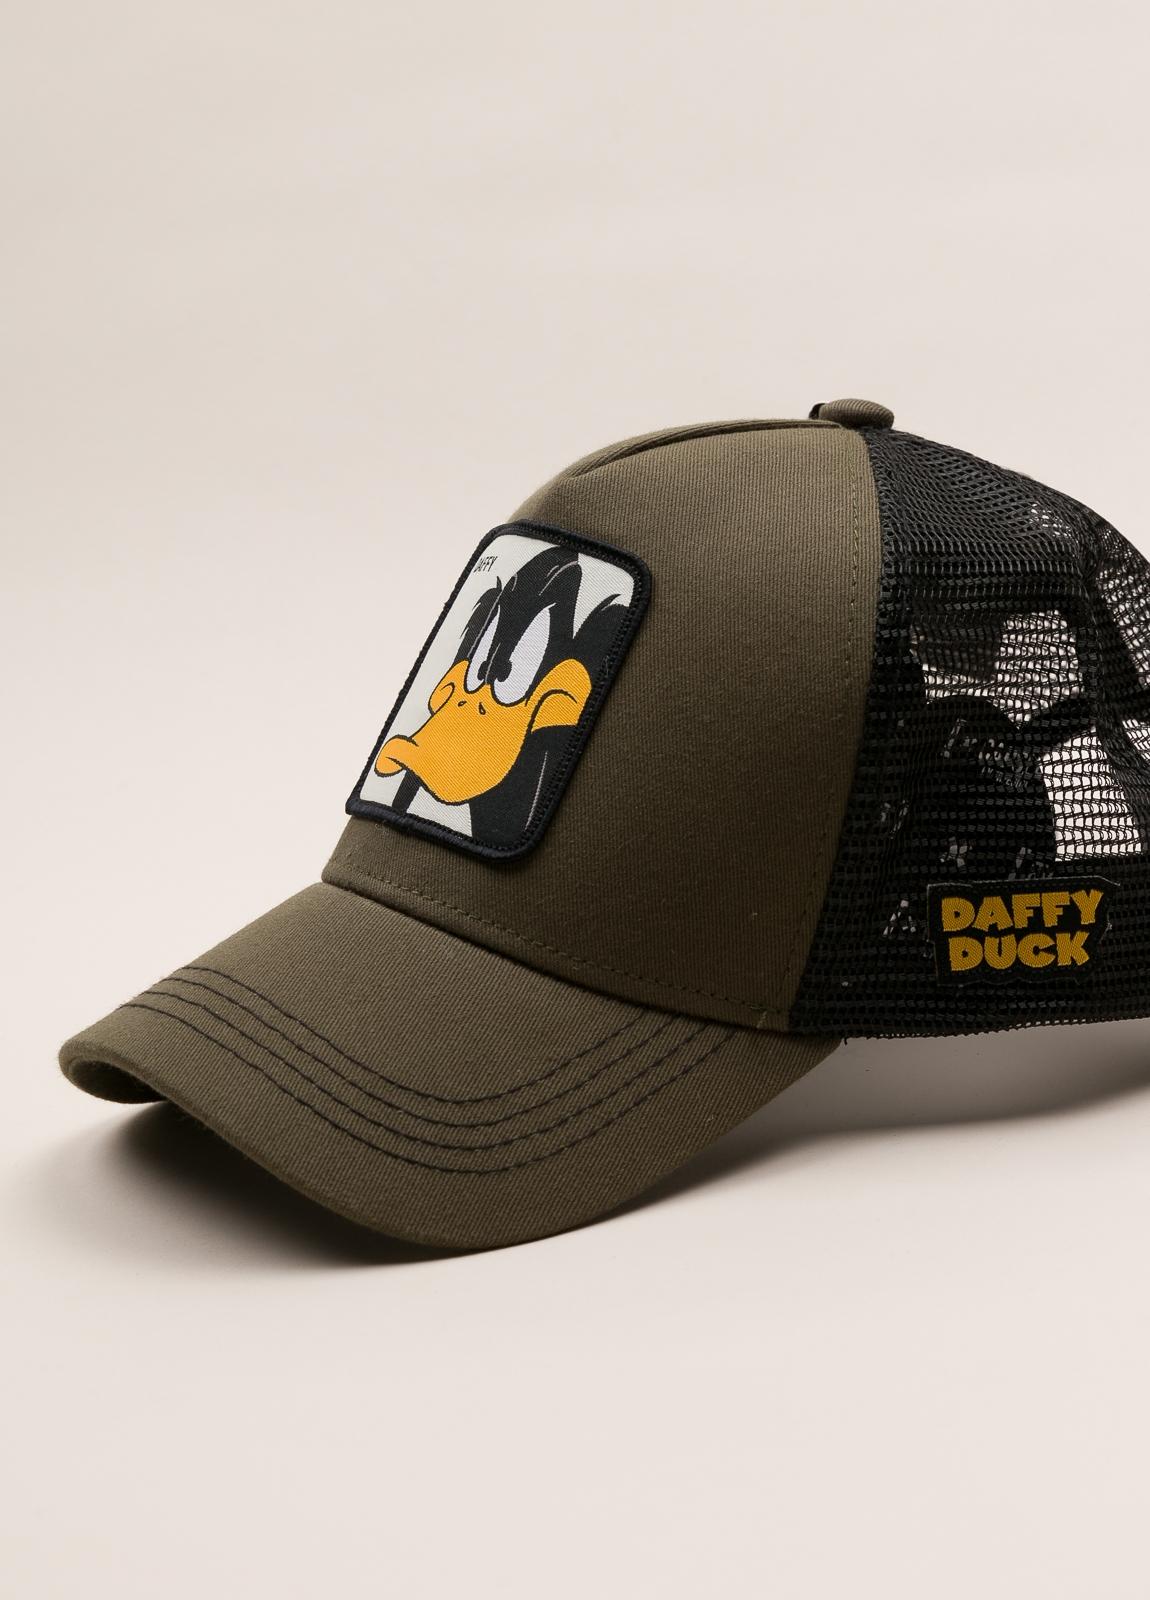 Gorra CAPSLAB Daffy Duck - Ítem1